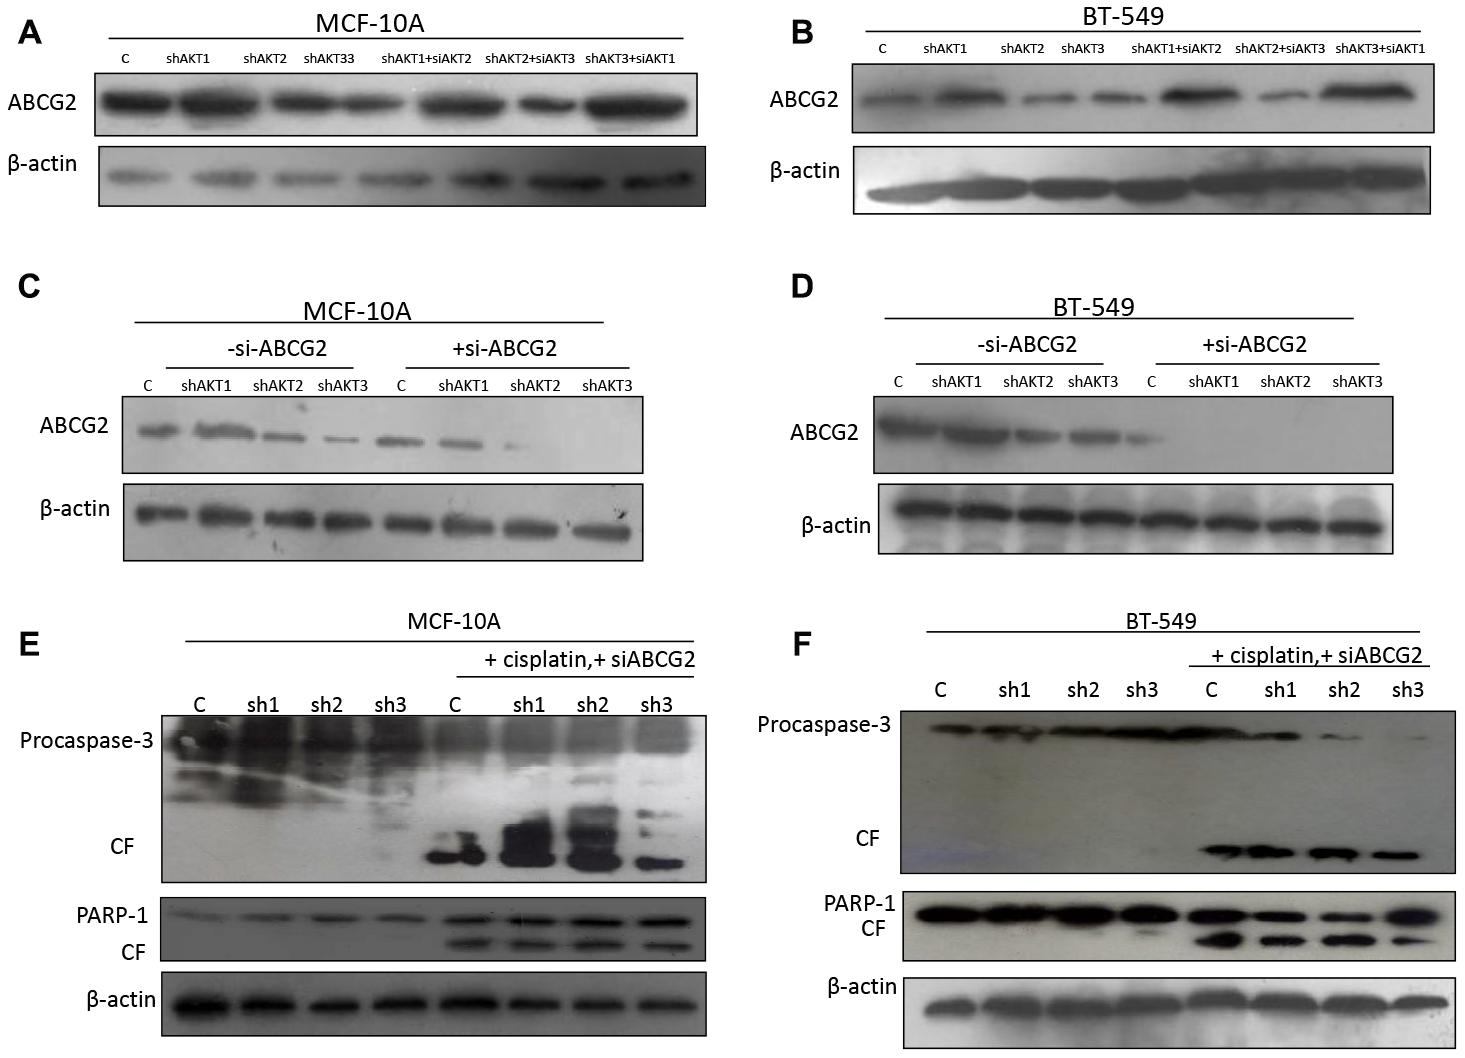 AKT1 effect on ABCG2 while abrogating cisplatin sensitivity.